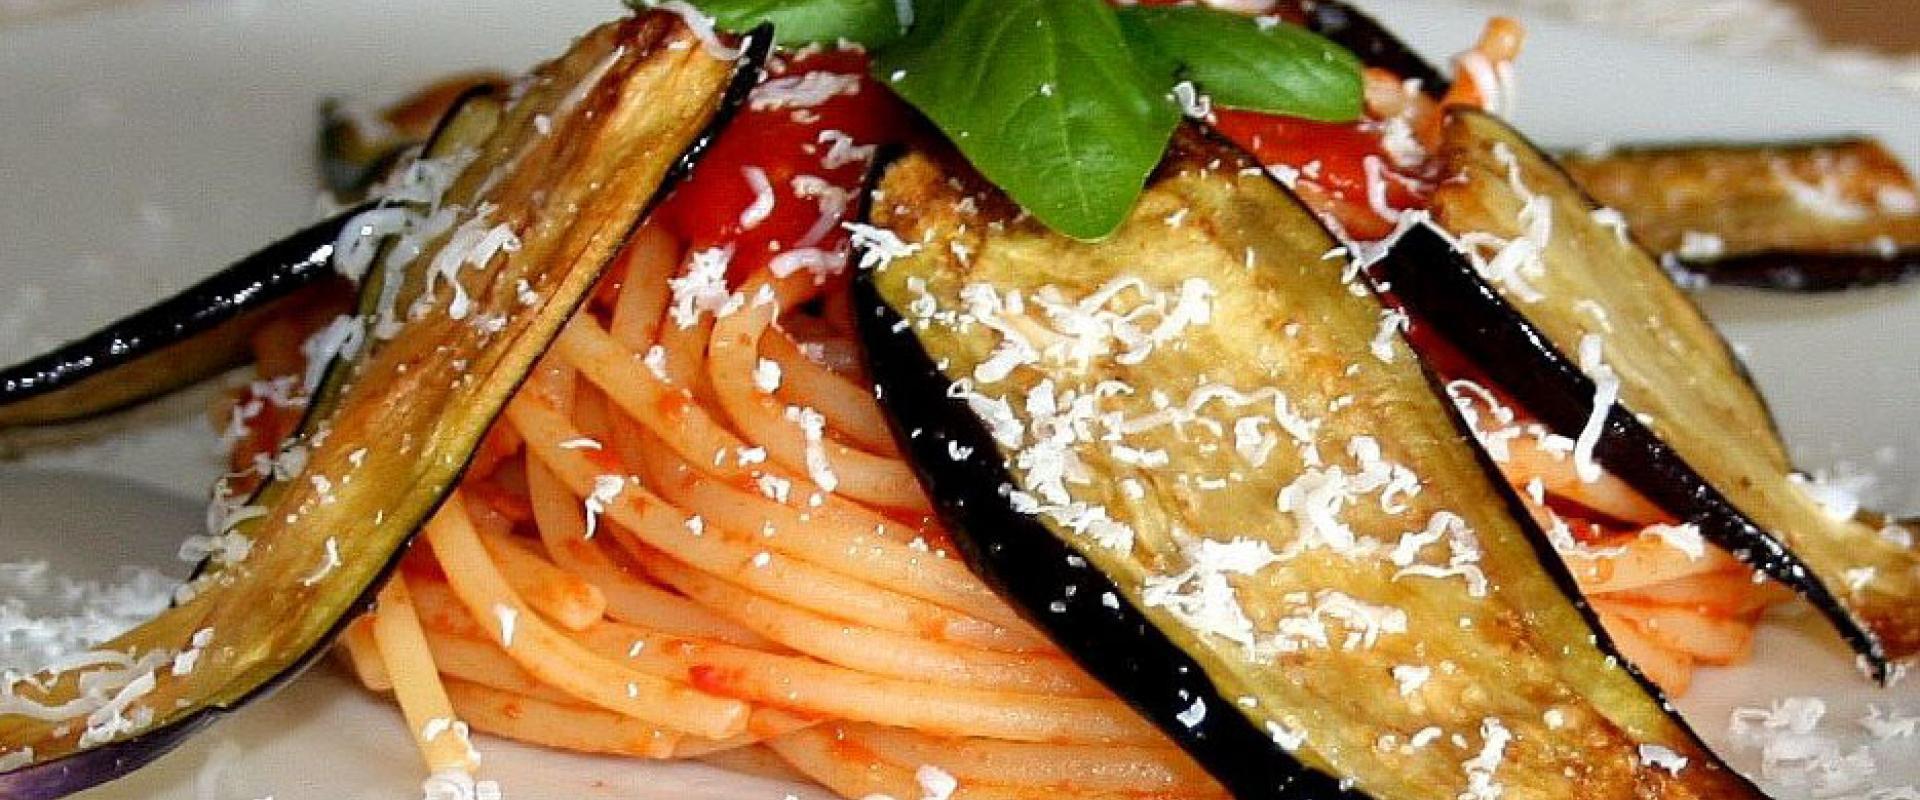 gourmet in Sicily